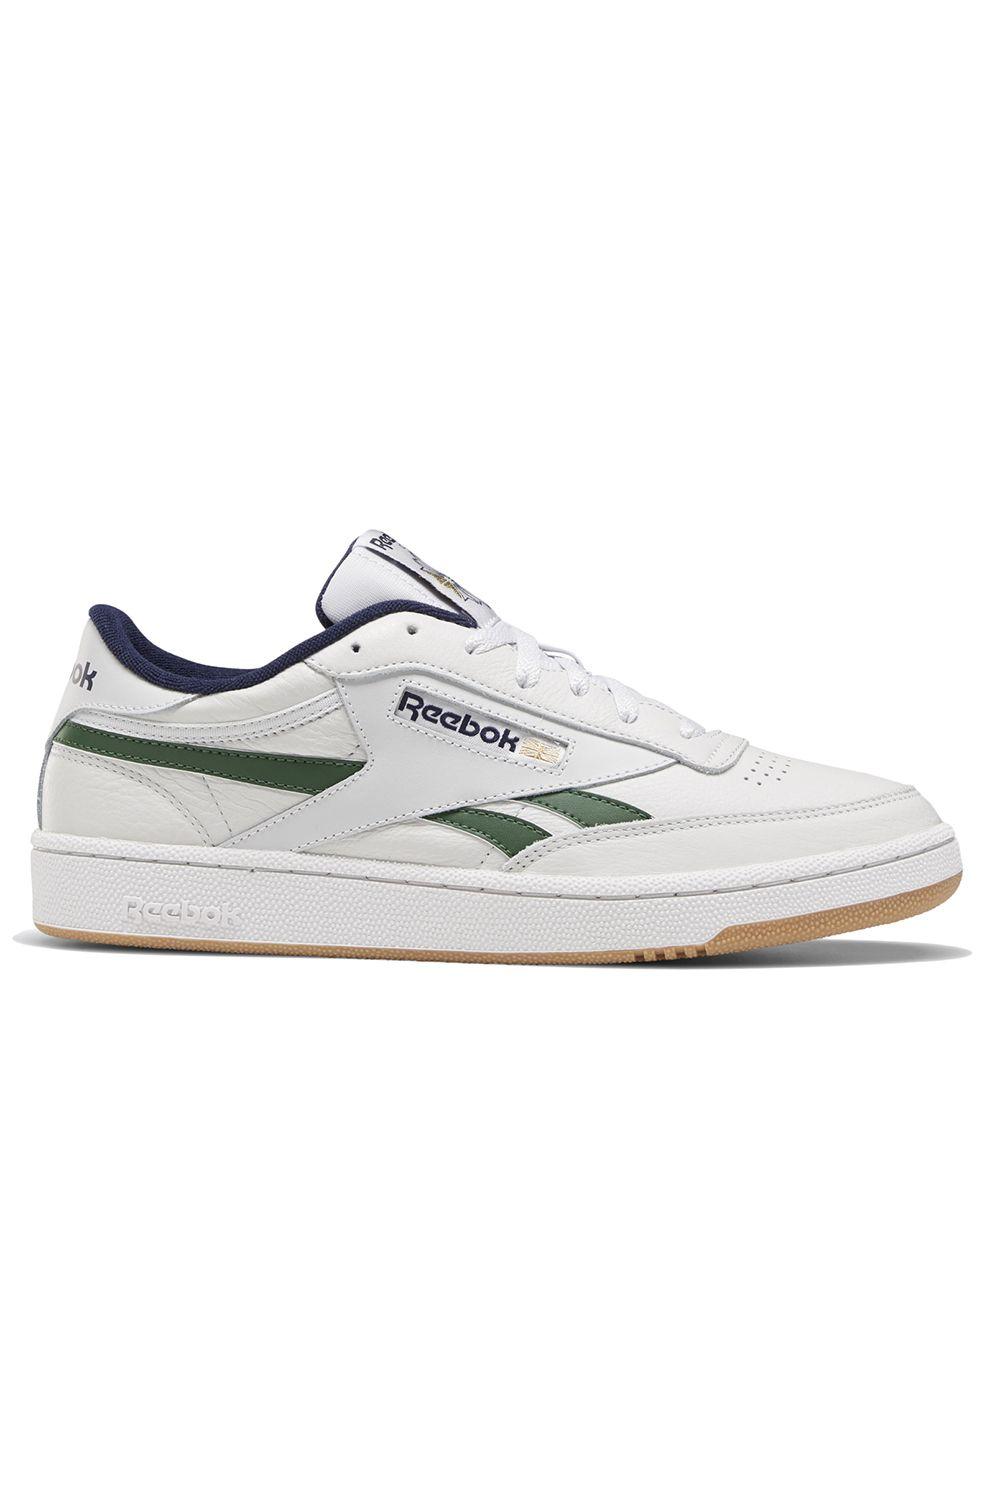 Reebok Shoes CLUB C REVENGE Porcelain/Utility Green/Vector Navy